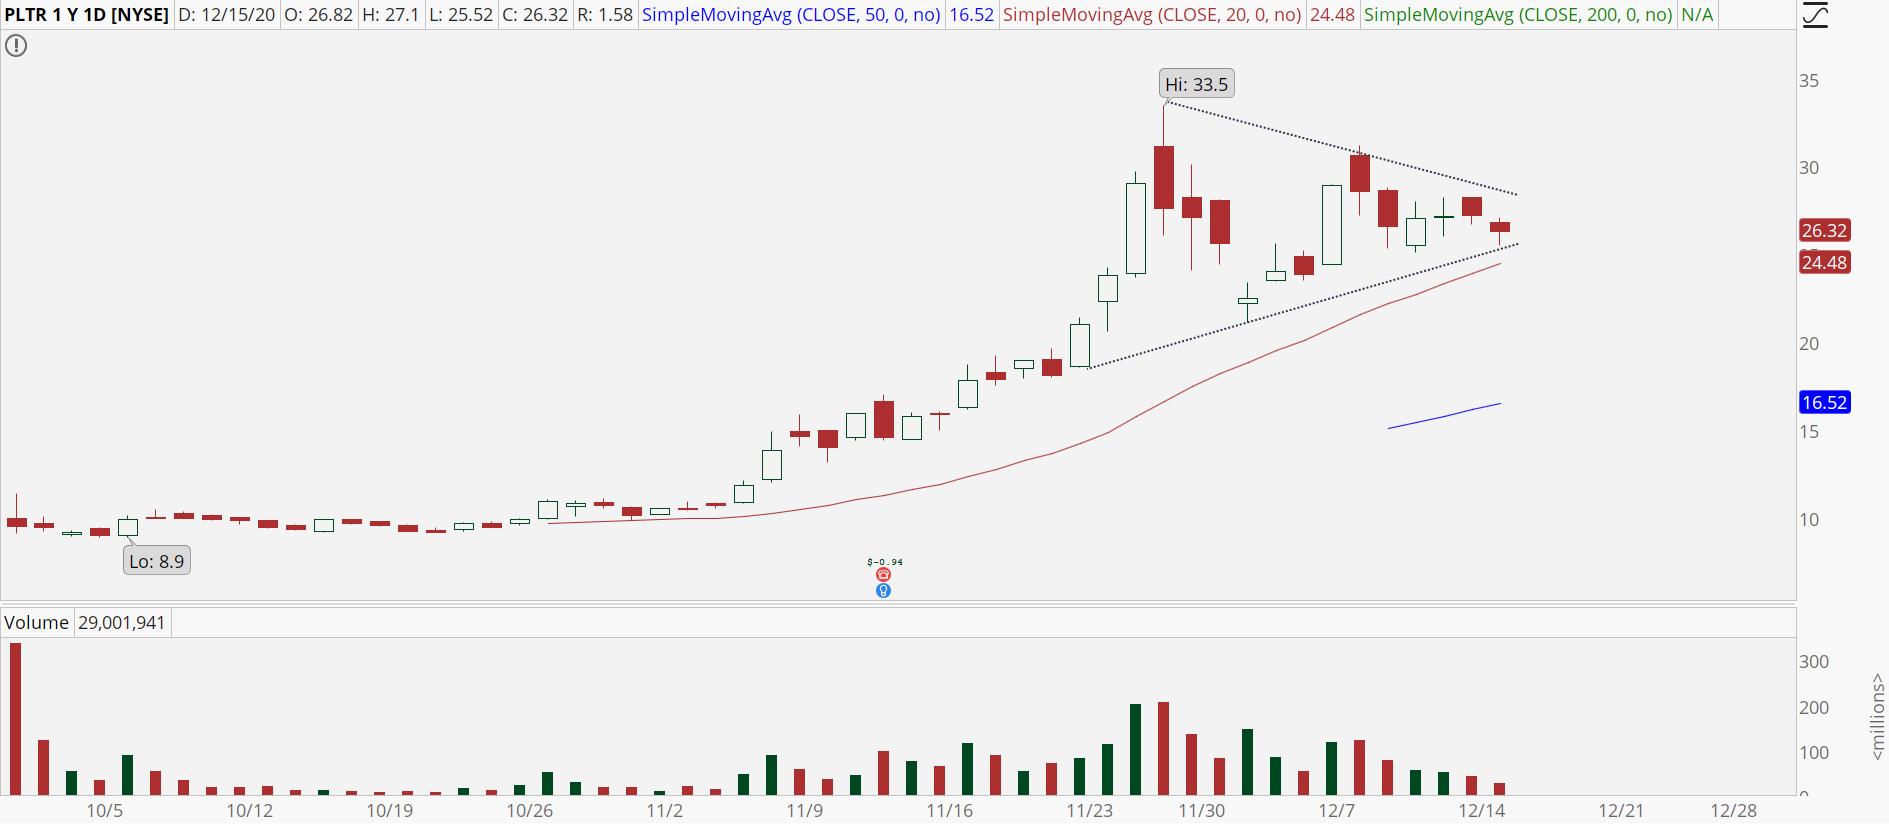 Palantir (PLTR) stock chart with symmetrical triangle